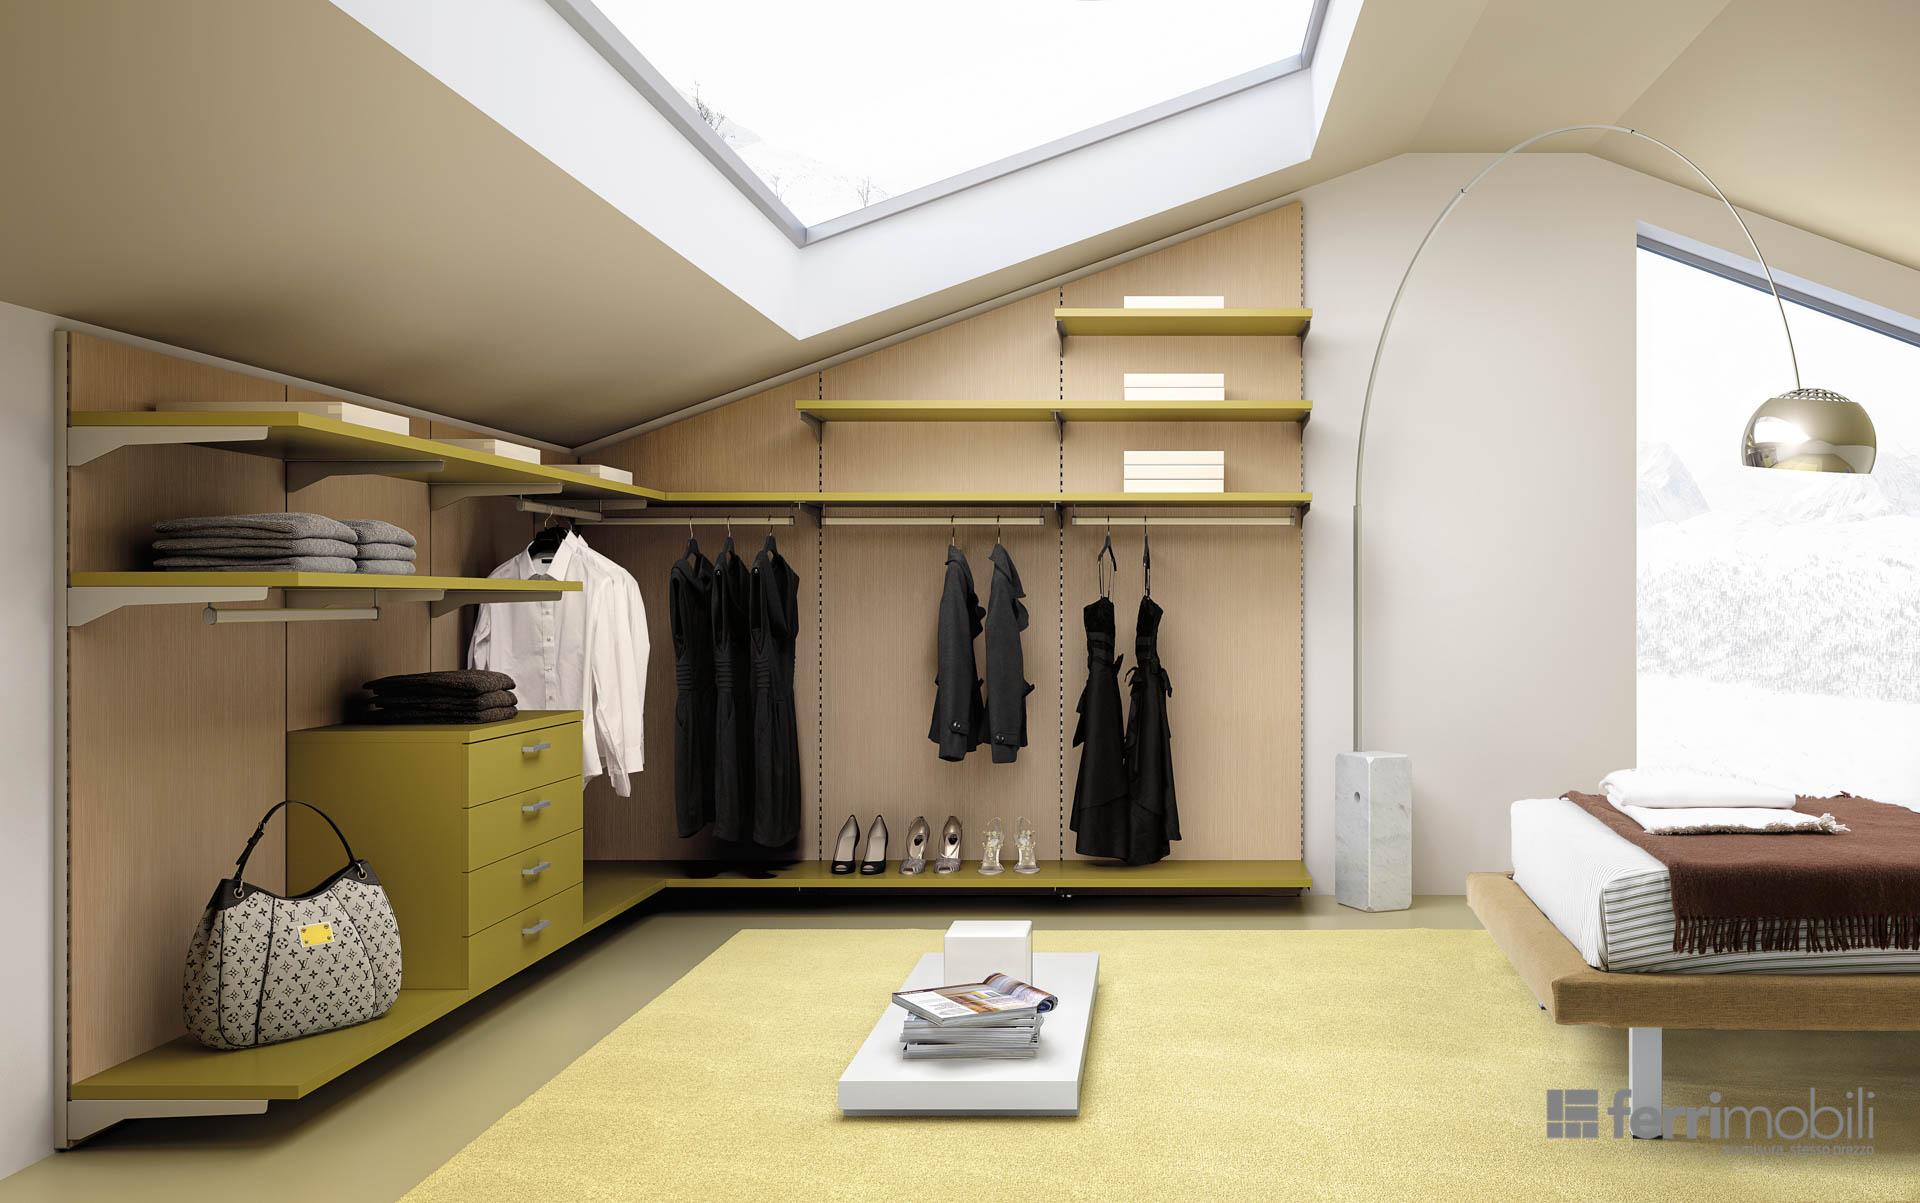 Cabina armadio 44 ferri mobili centro mobili - Cabine armadio moderne ikea ...